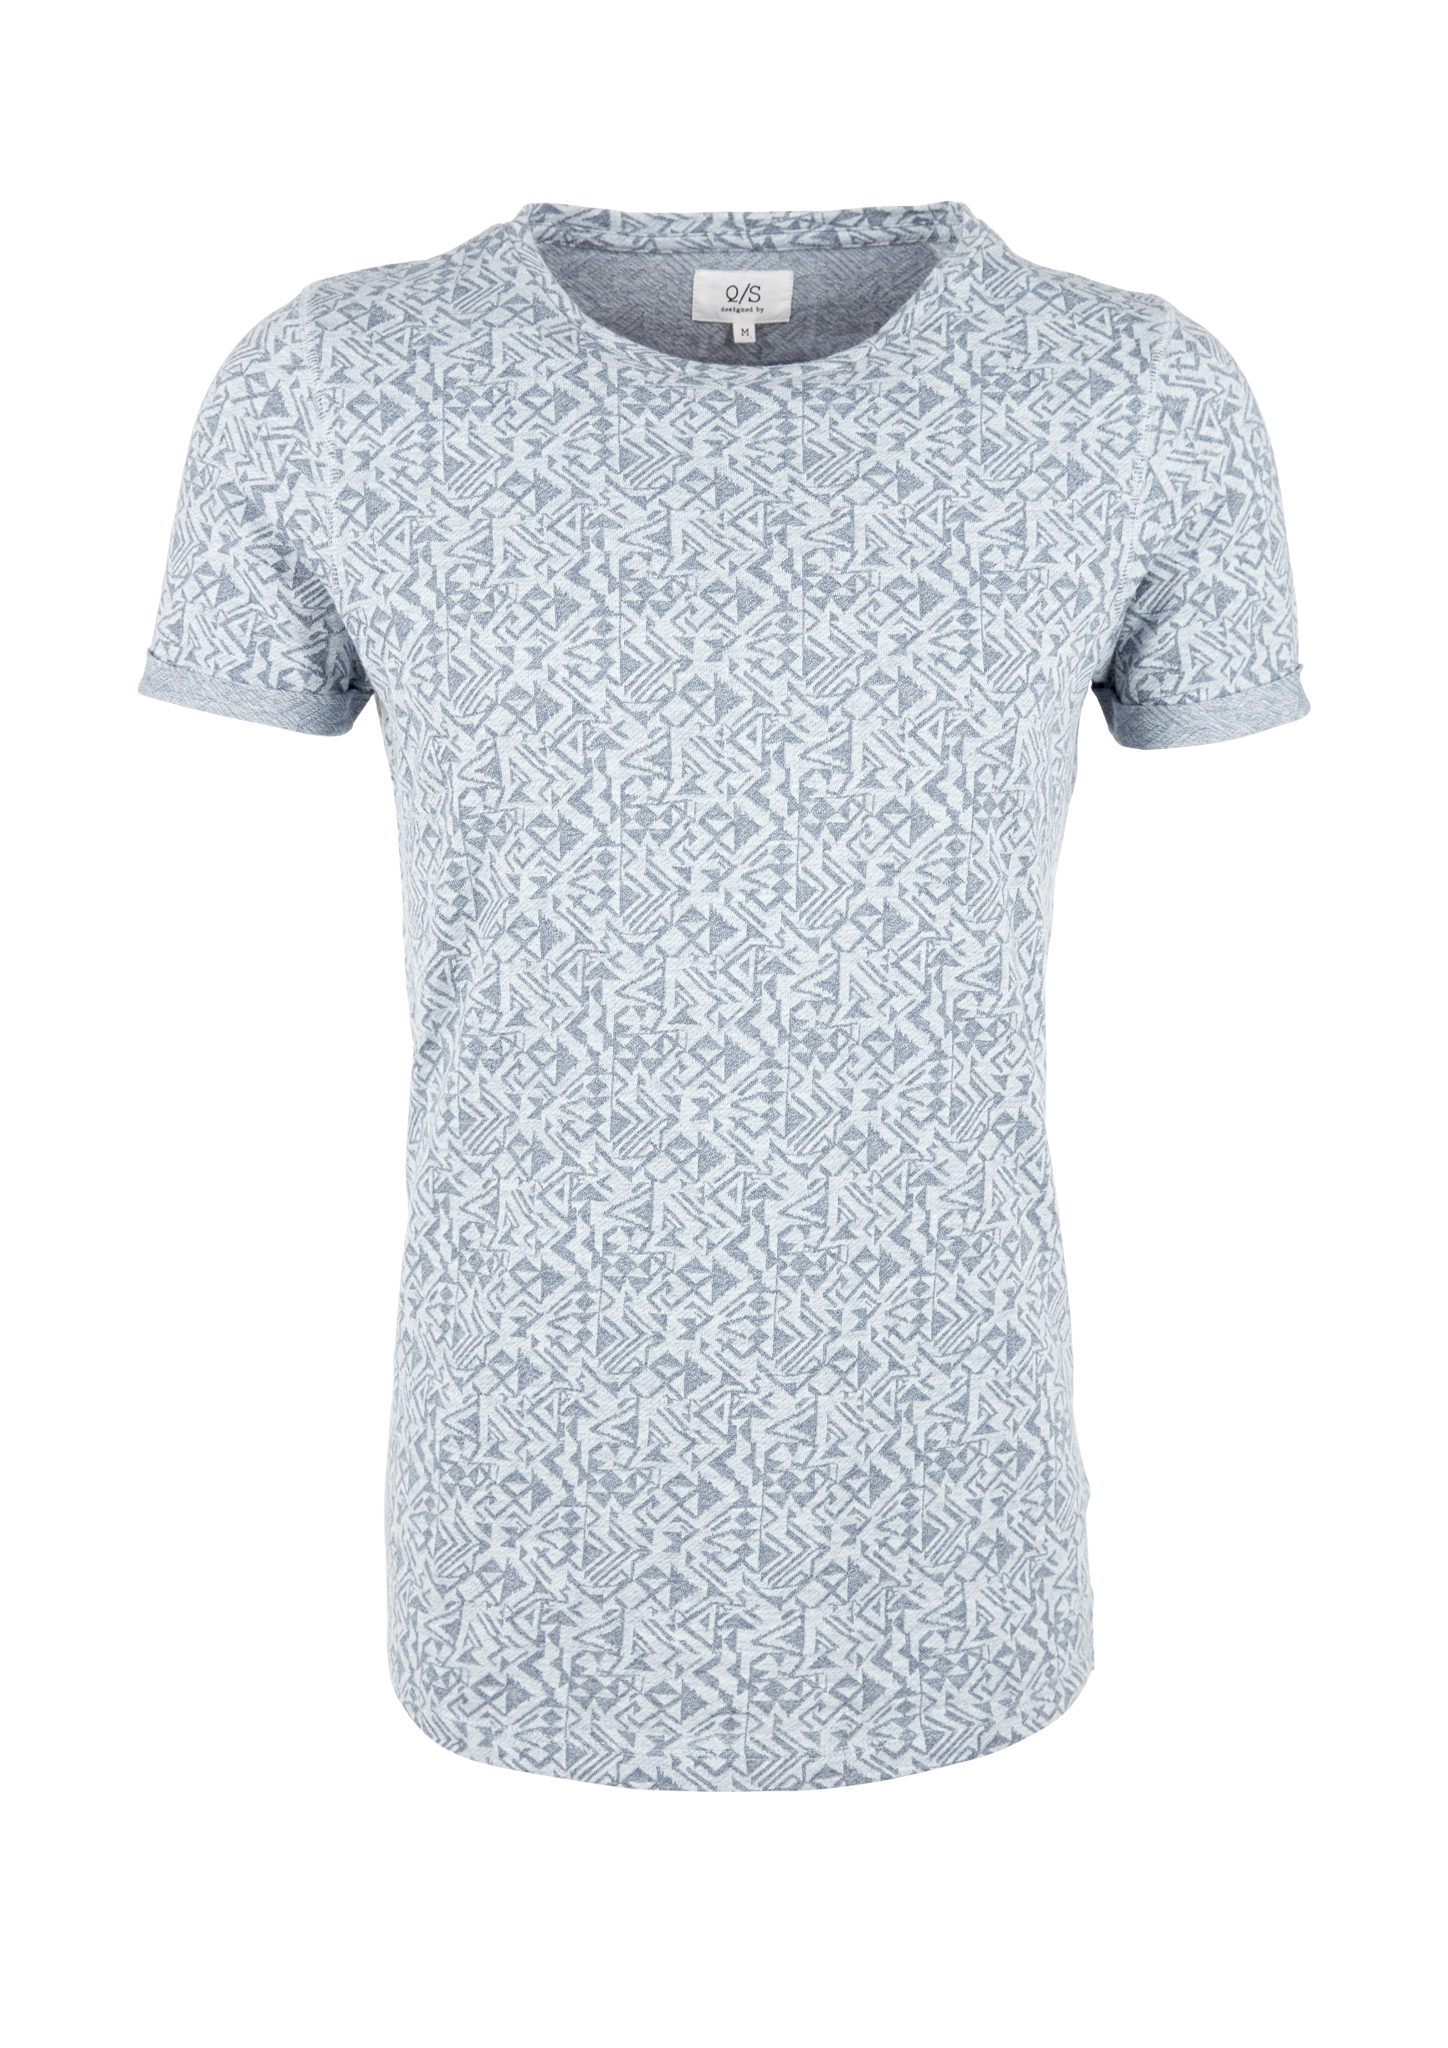 Jacquard-Shirt | Bekleidung > Shirts > Sonstige Shirts | Q/S designed by